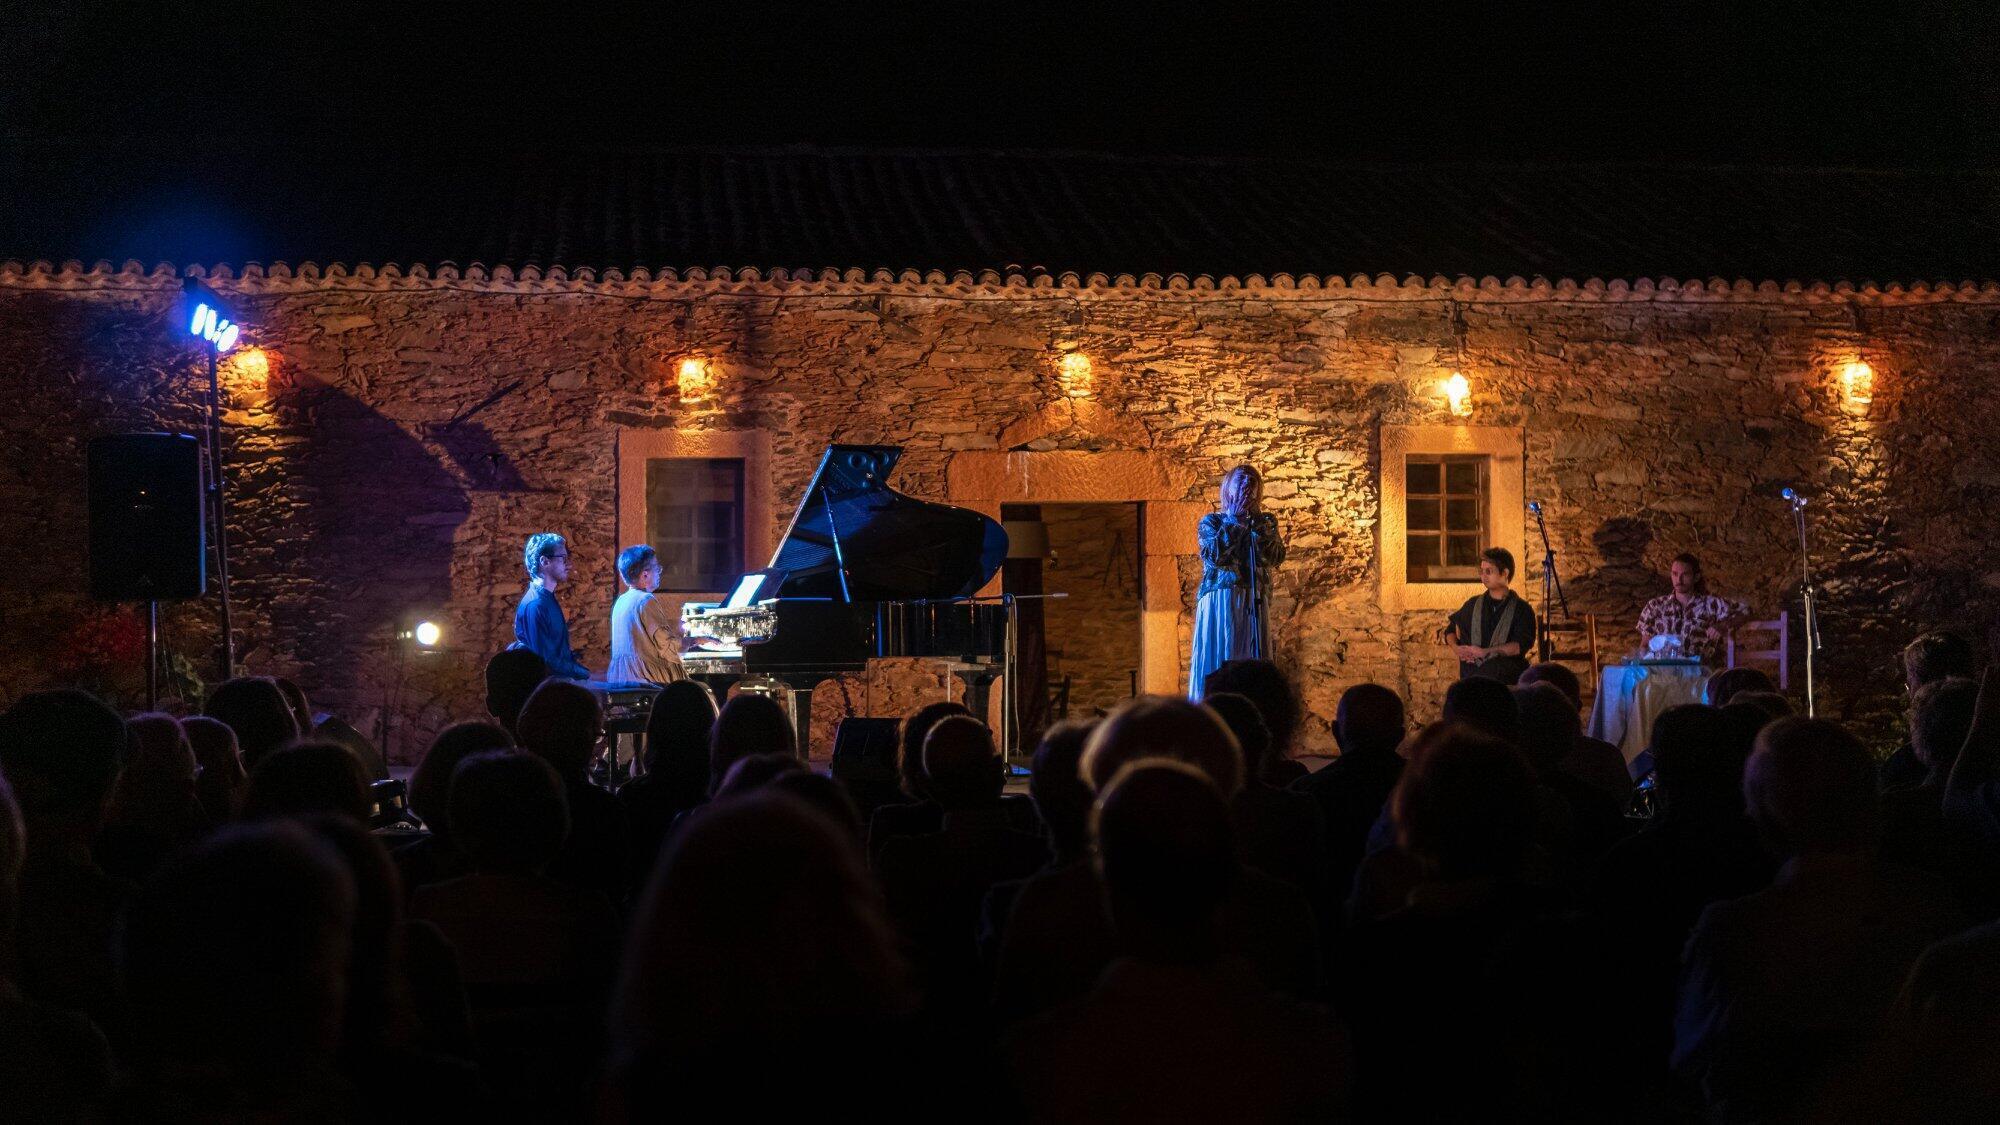 Concerto com Teo Gheorghiu, Fumiaki Miura, Mísia, Grupo Coral e Etnográfico da Casa do Povo de Serpa no Centro de Artes de Belgais